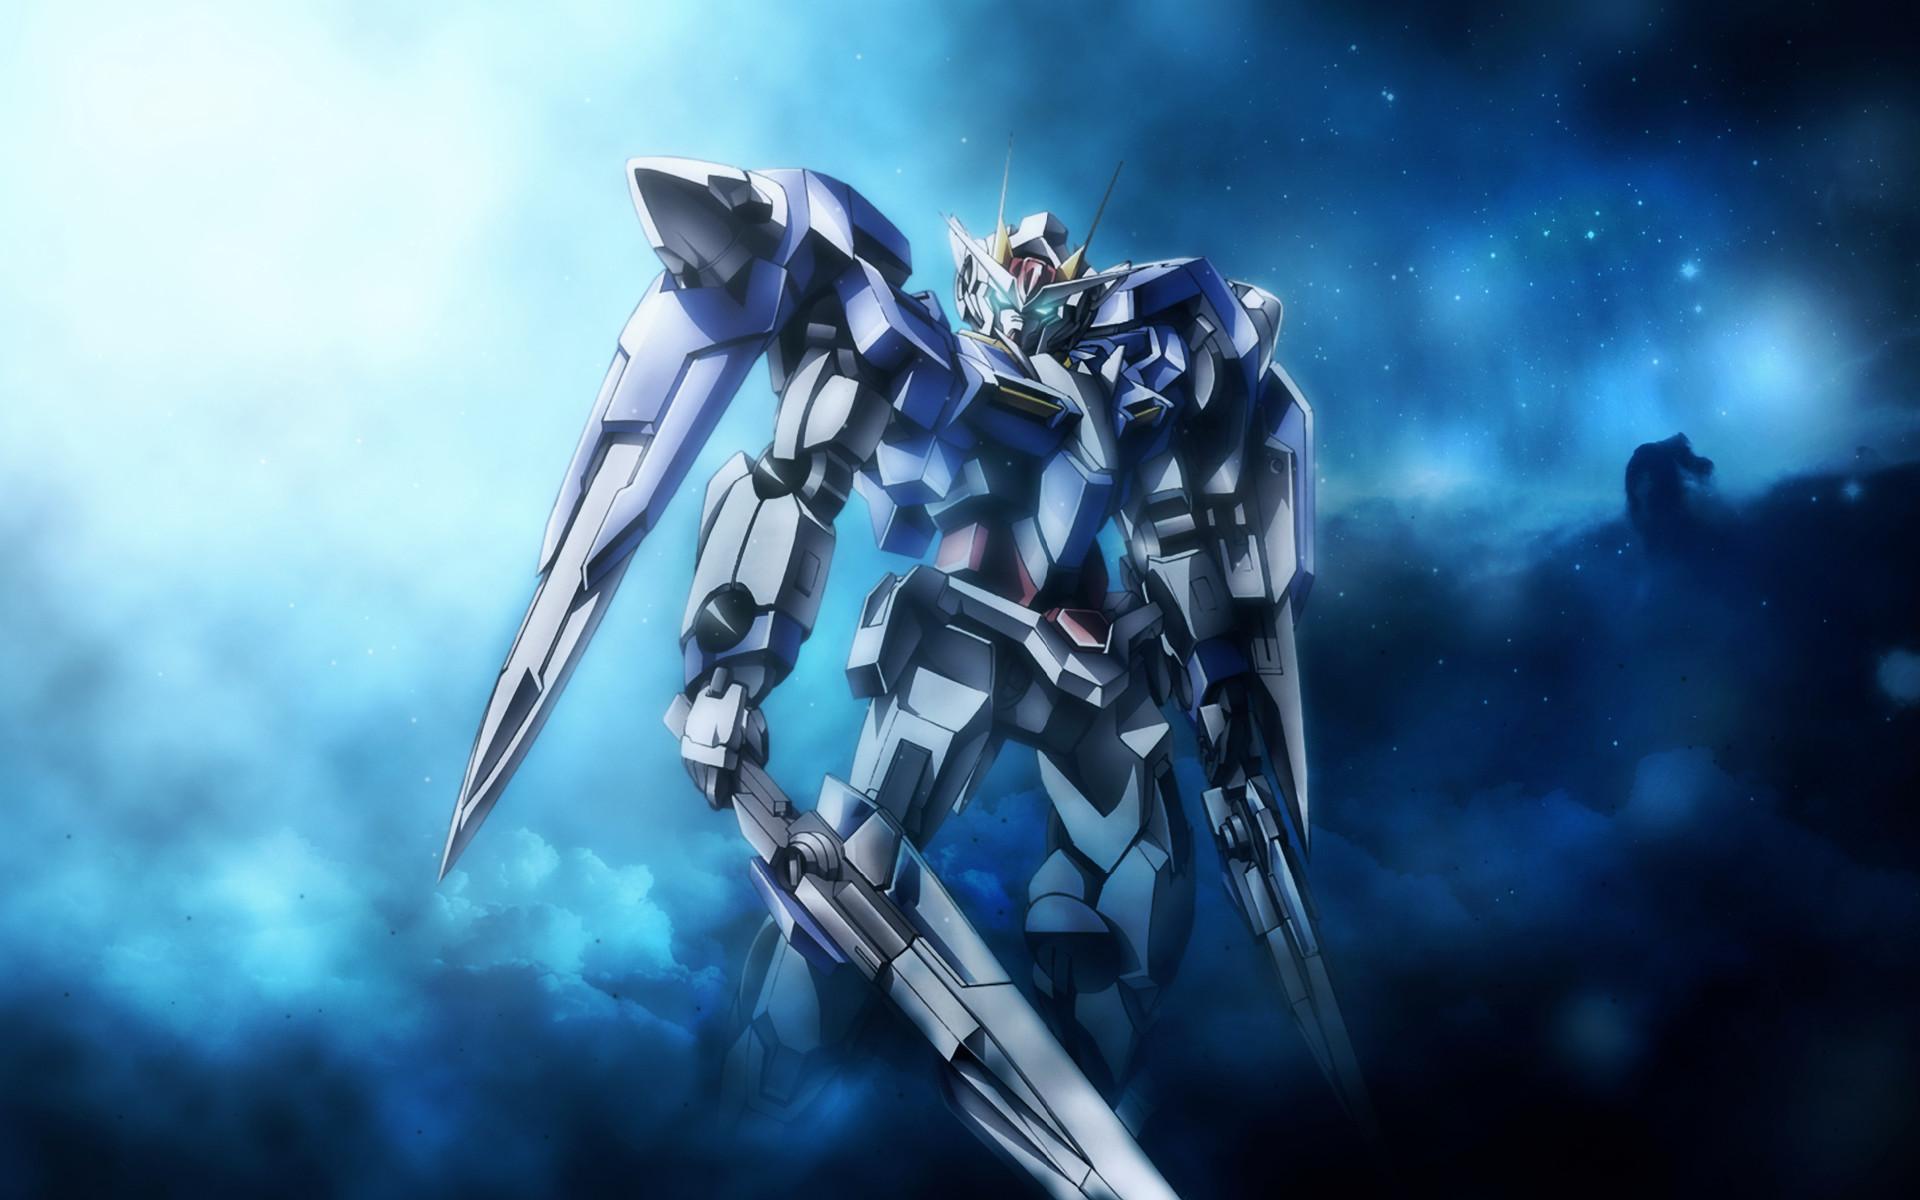 Gundam Wallpaper HD Download. Unicorn Gundam HD Wallpaper